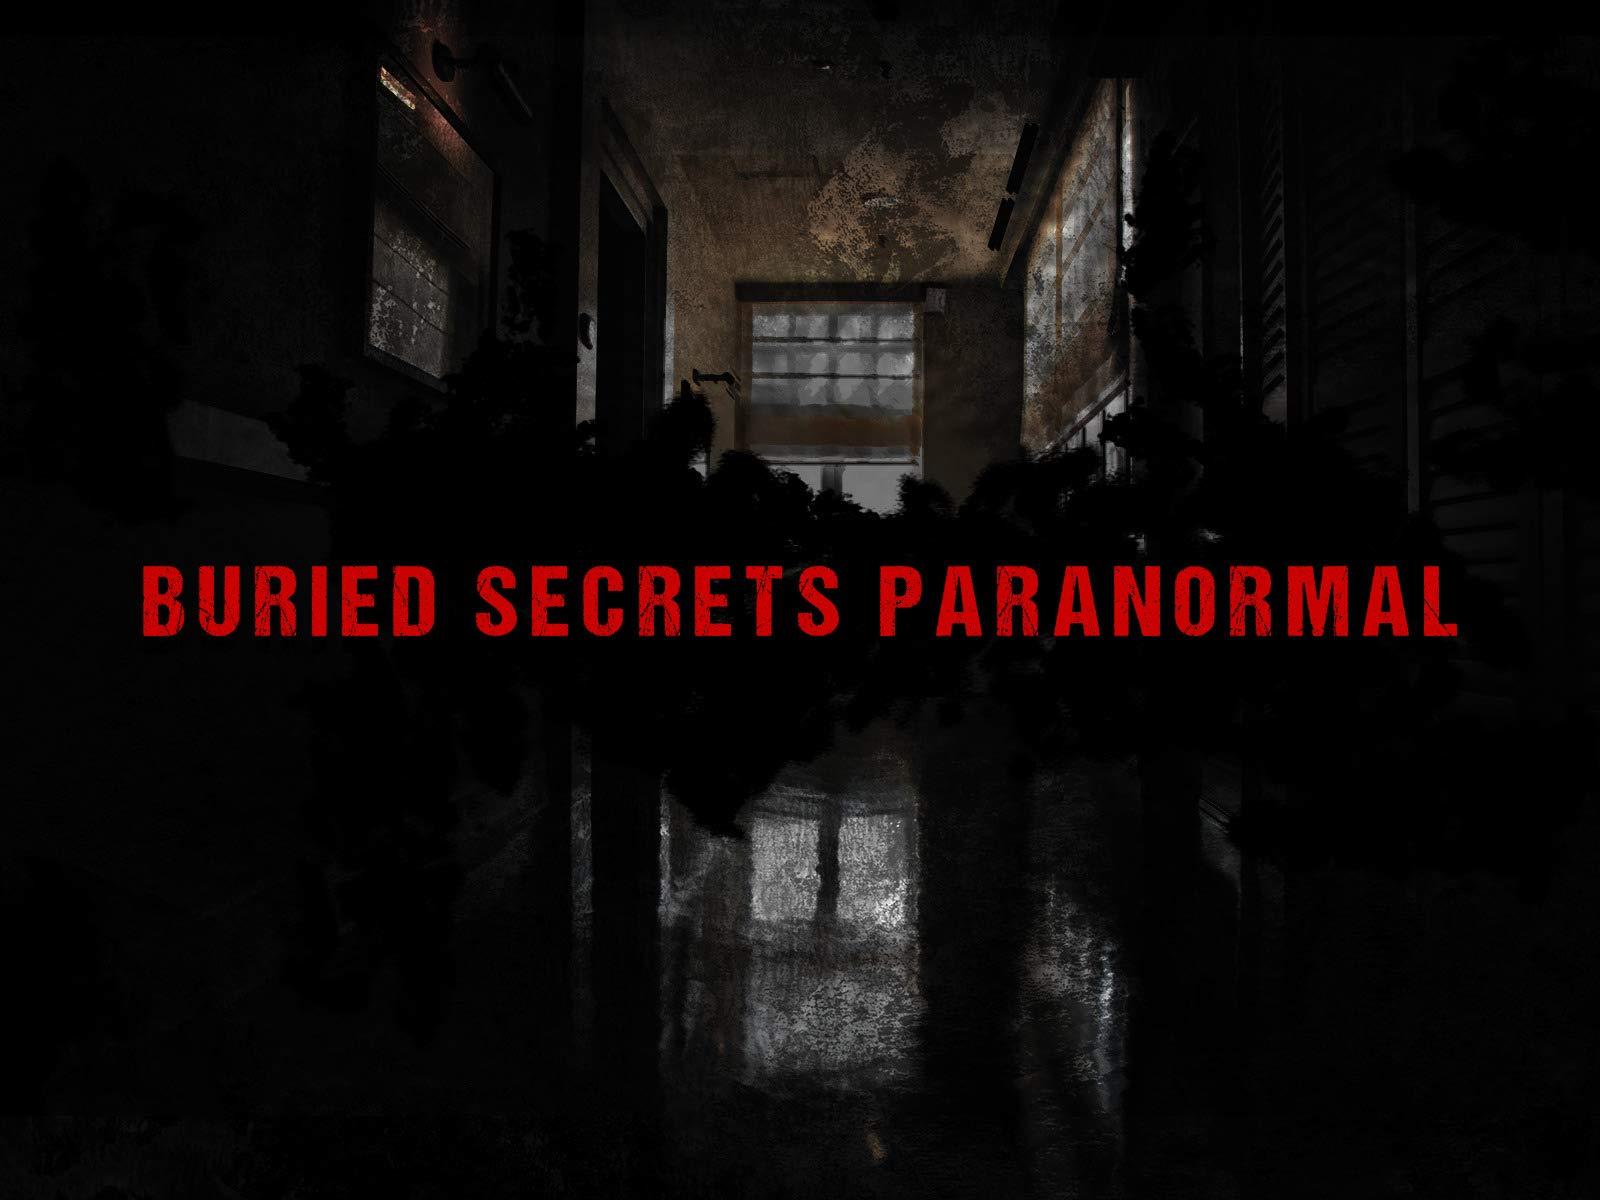 Buried Secrets Paranormal